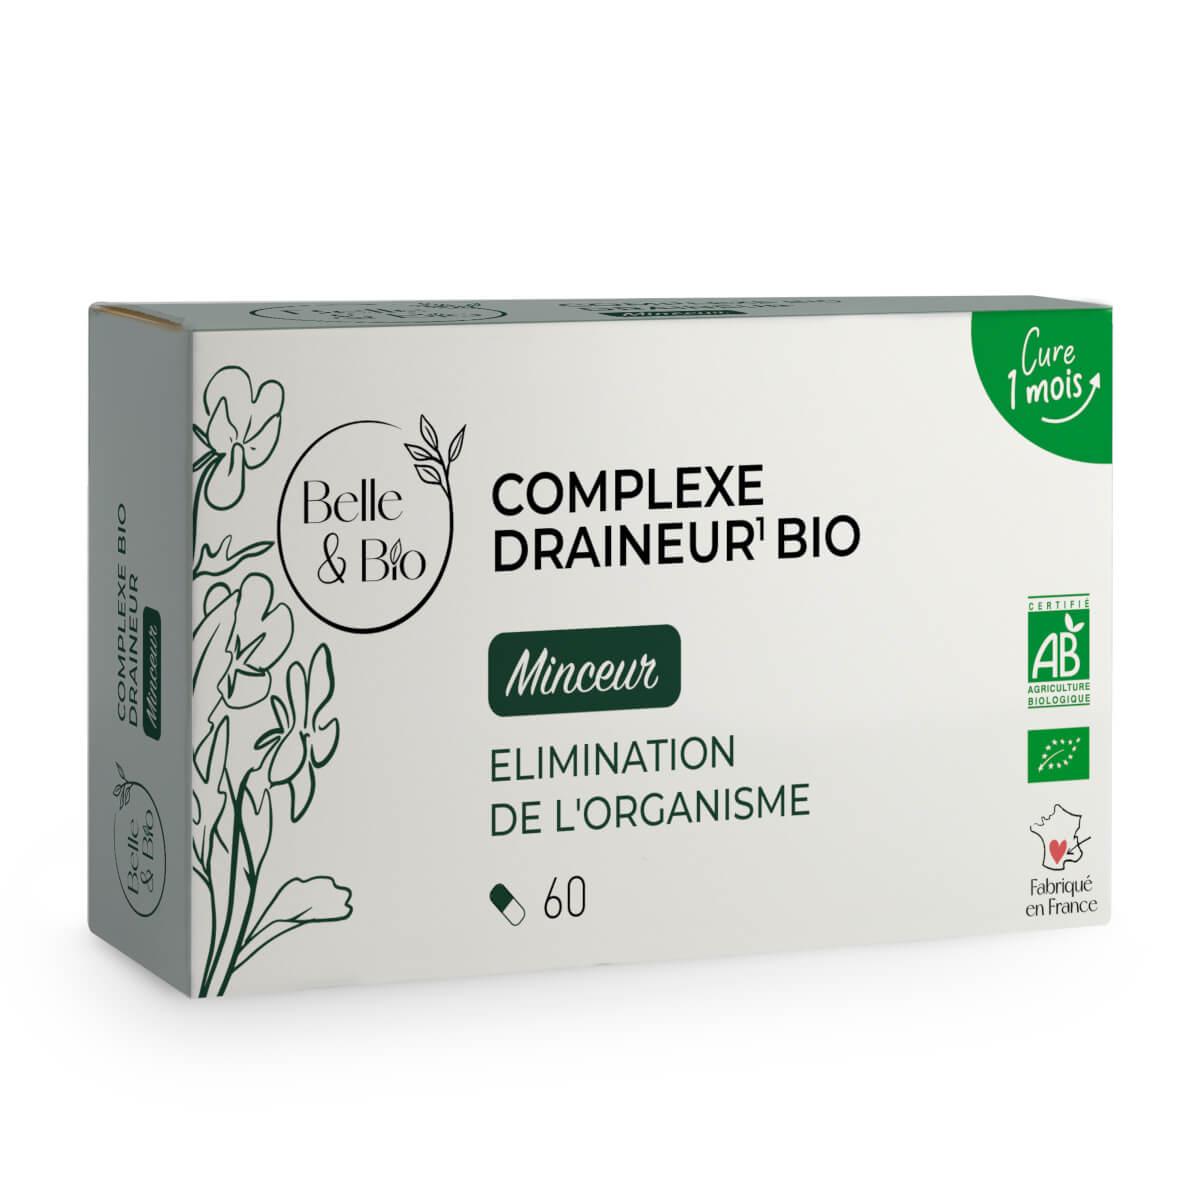 Belle & Bio - Complexe Draineur Bio - Action Detox - 60 Gelules